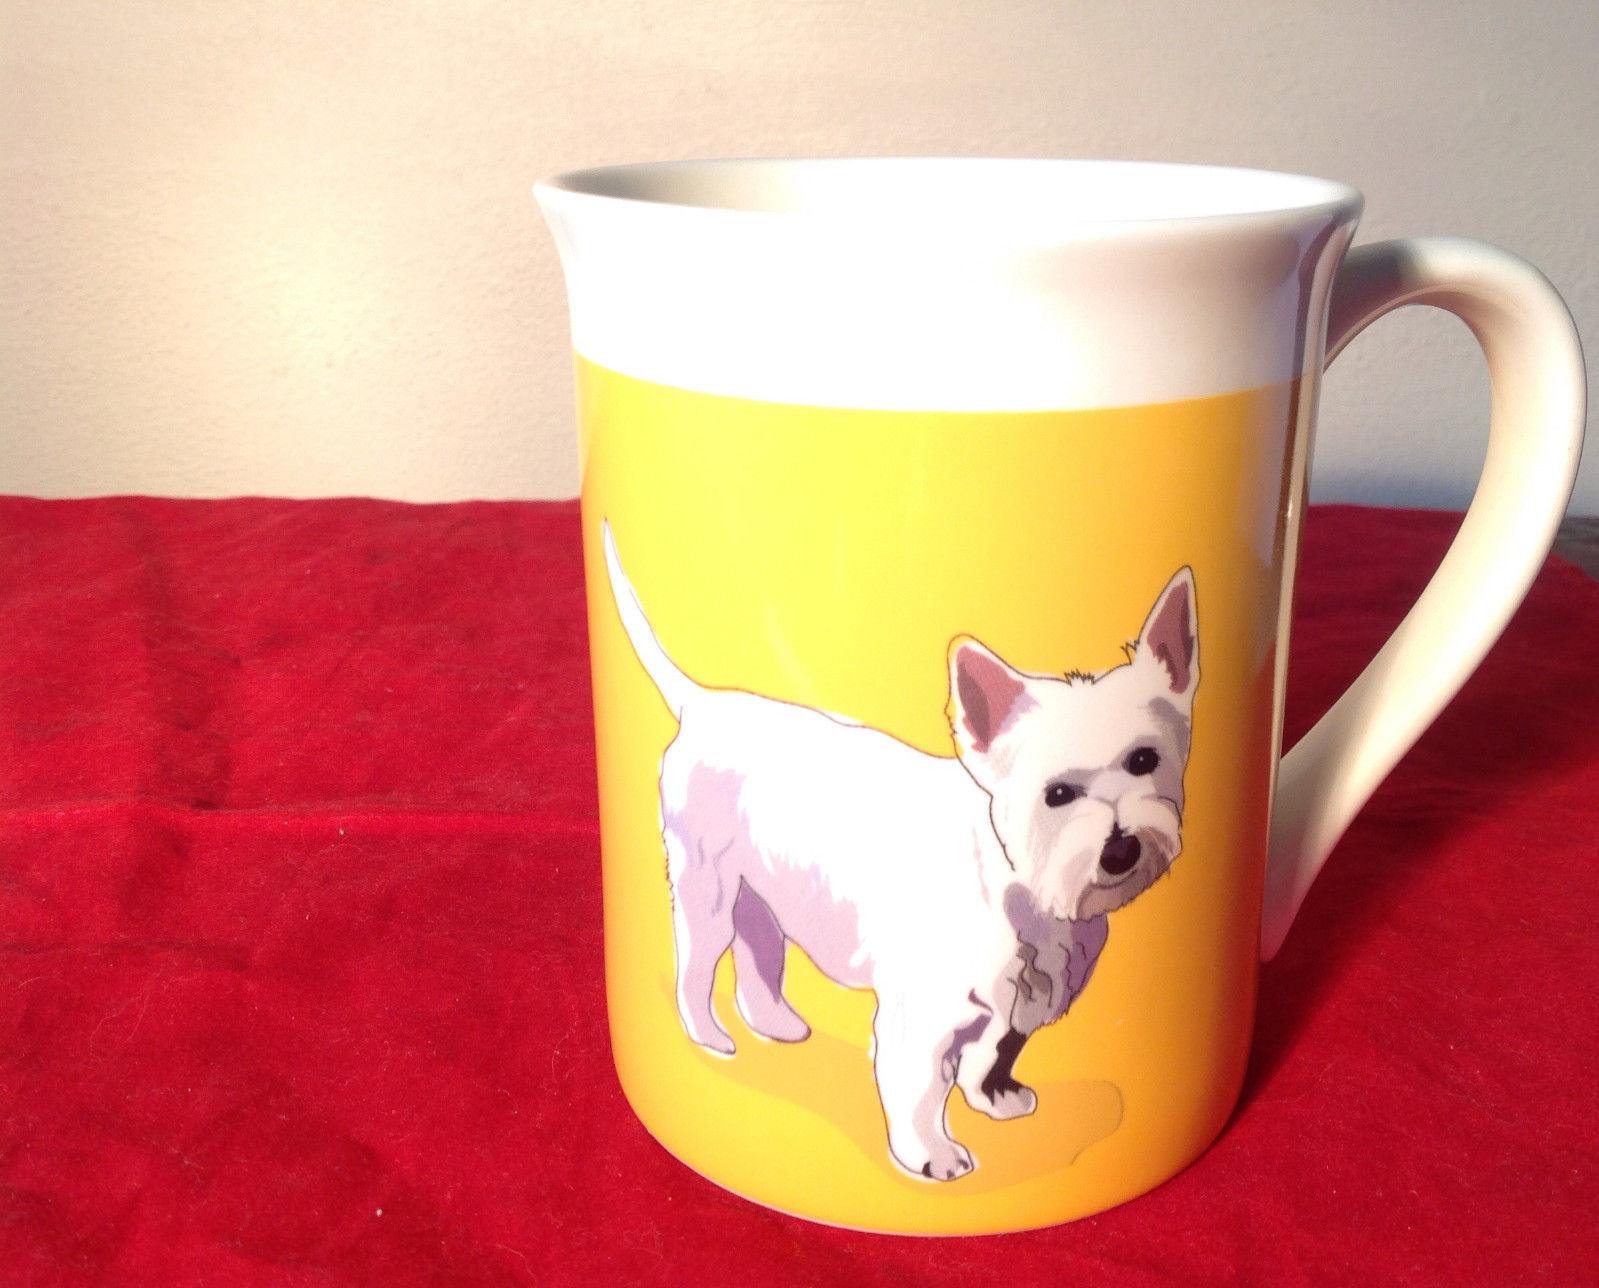 Go Dog Westie Mug by Paper Russells w Original Box 16 oz Department 56